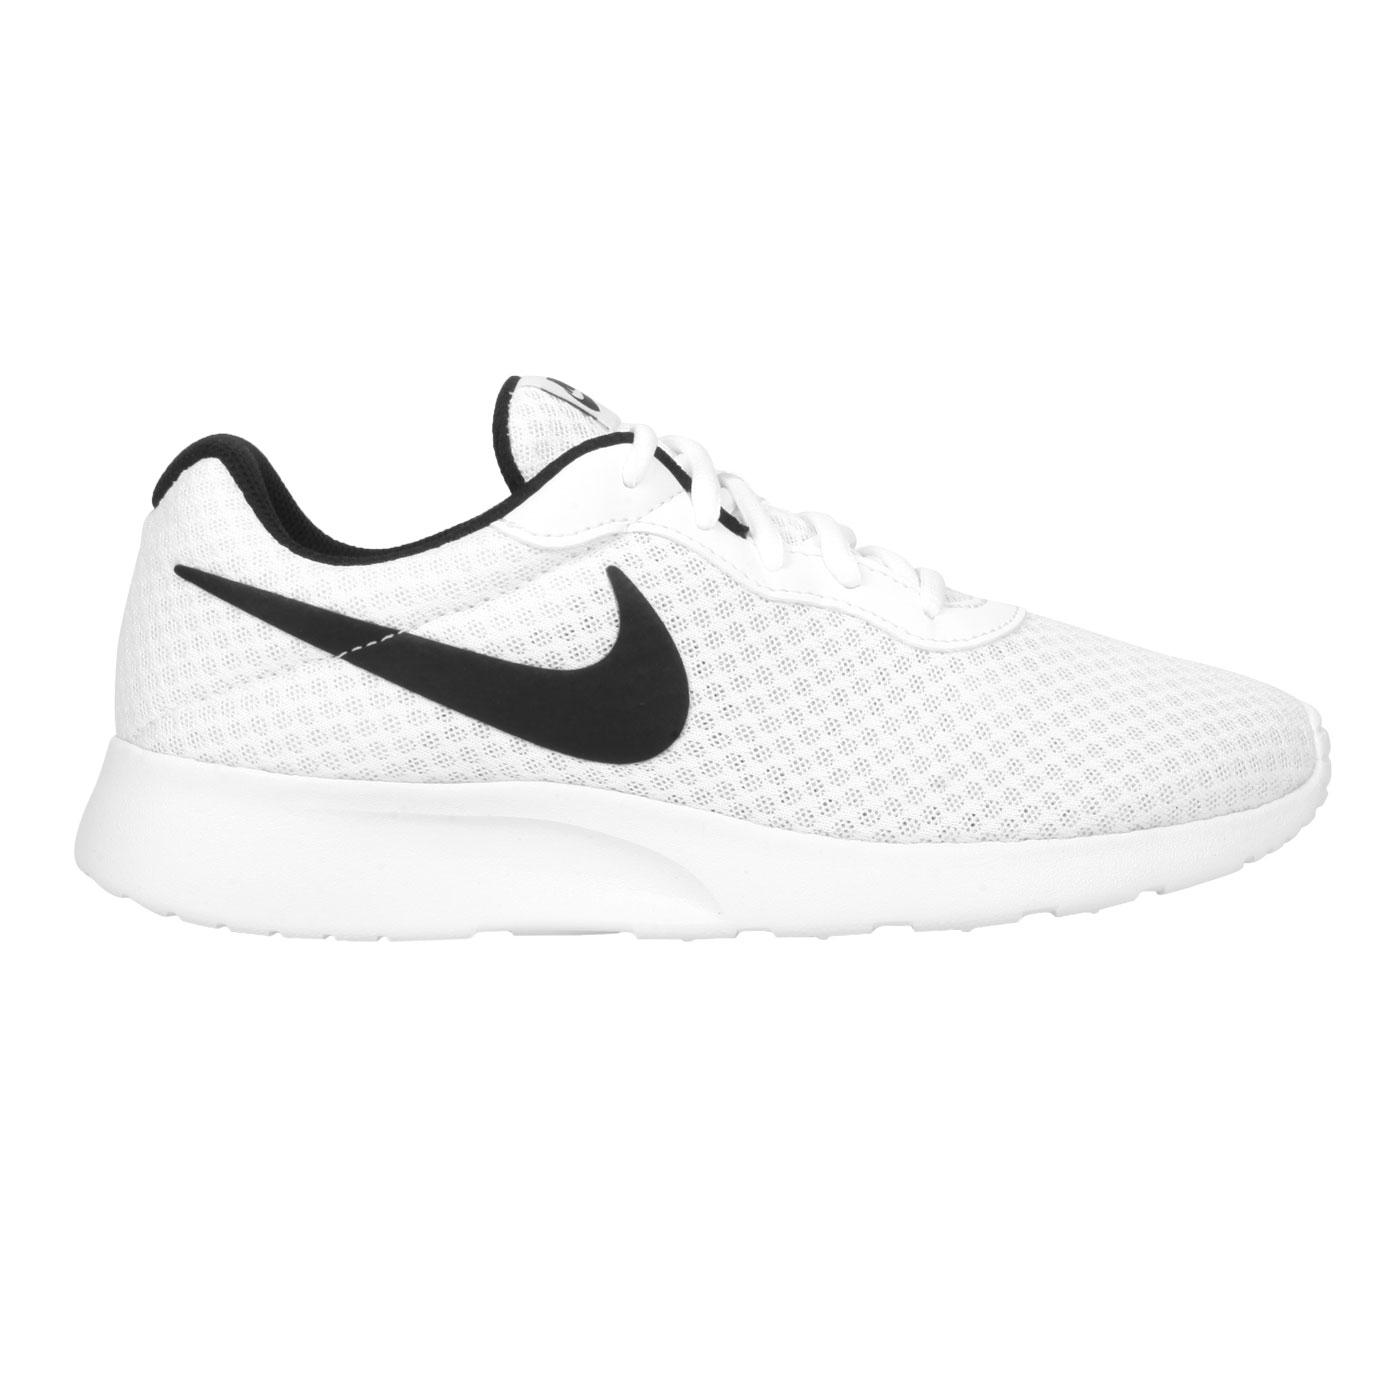 NIKE 女款休閒運動鞋  @WMNS TANJUN@812655100 - 白黑